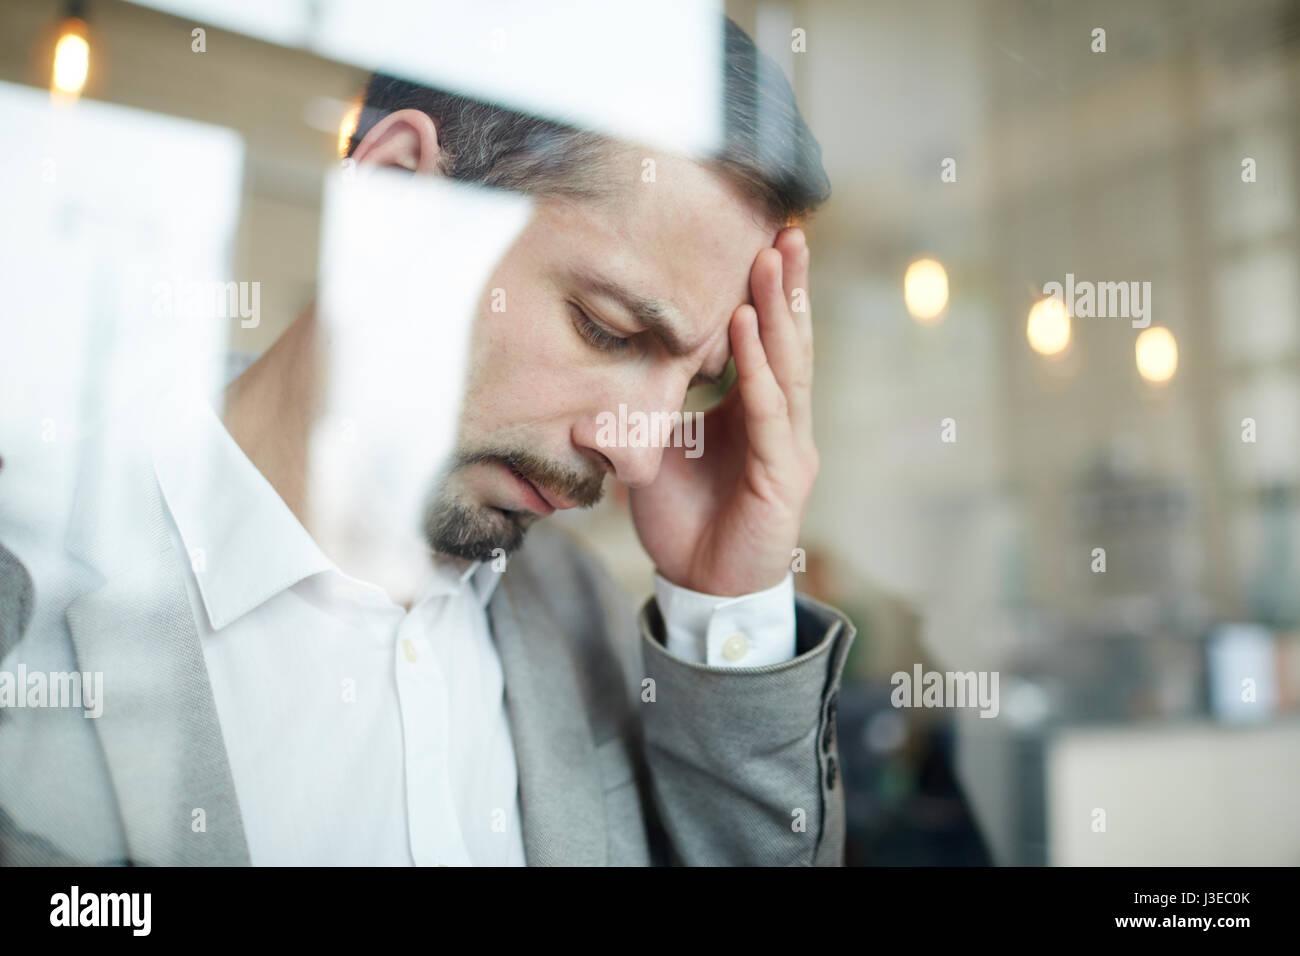 Hombre cansado Imagen De Stock